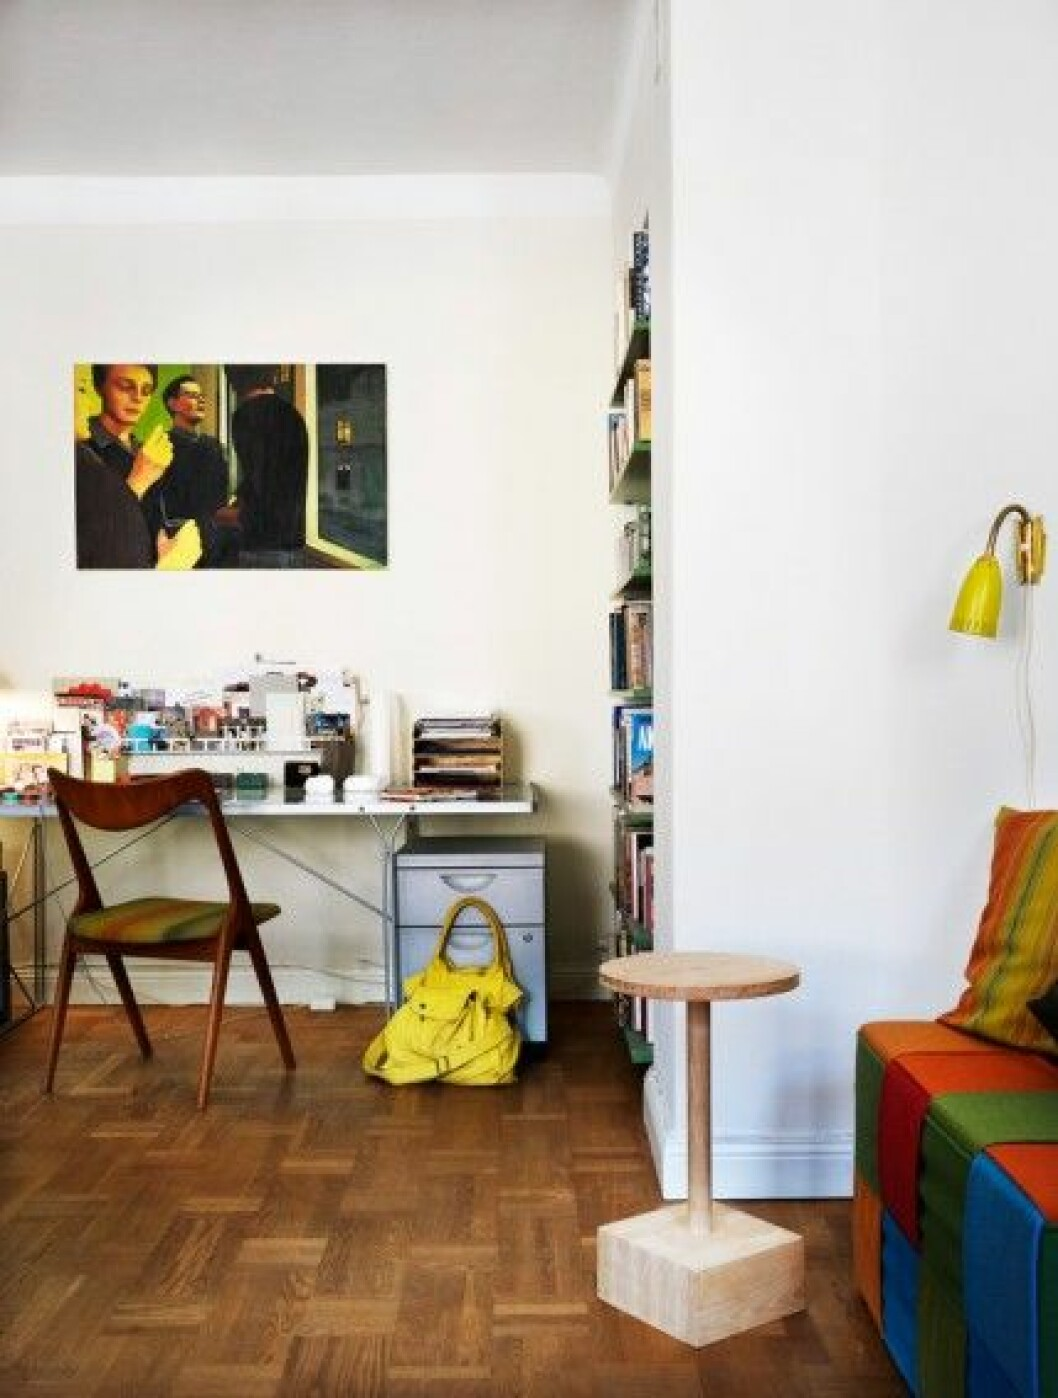 vardagsrum-arbetsplats-inbyggd-bokhylla-foto-Patric-Johansson